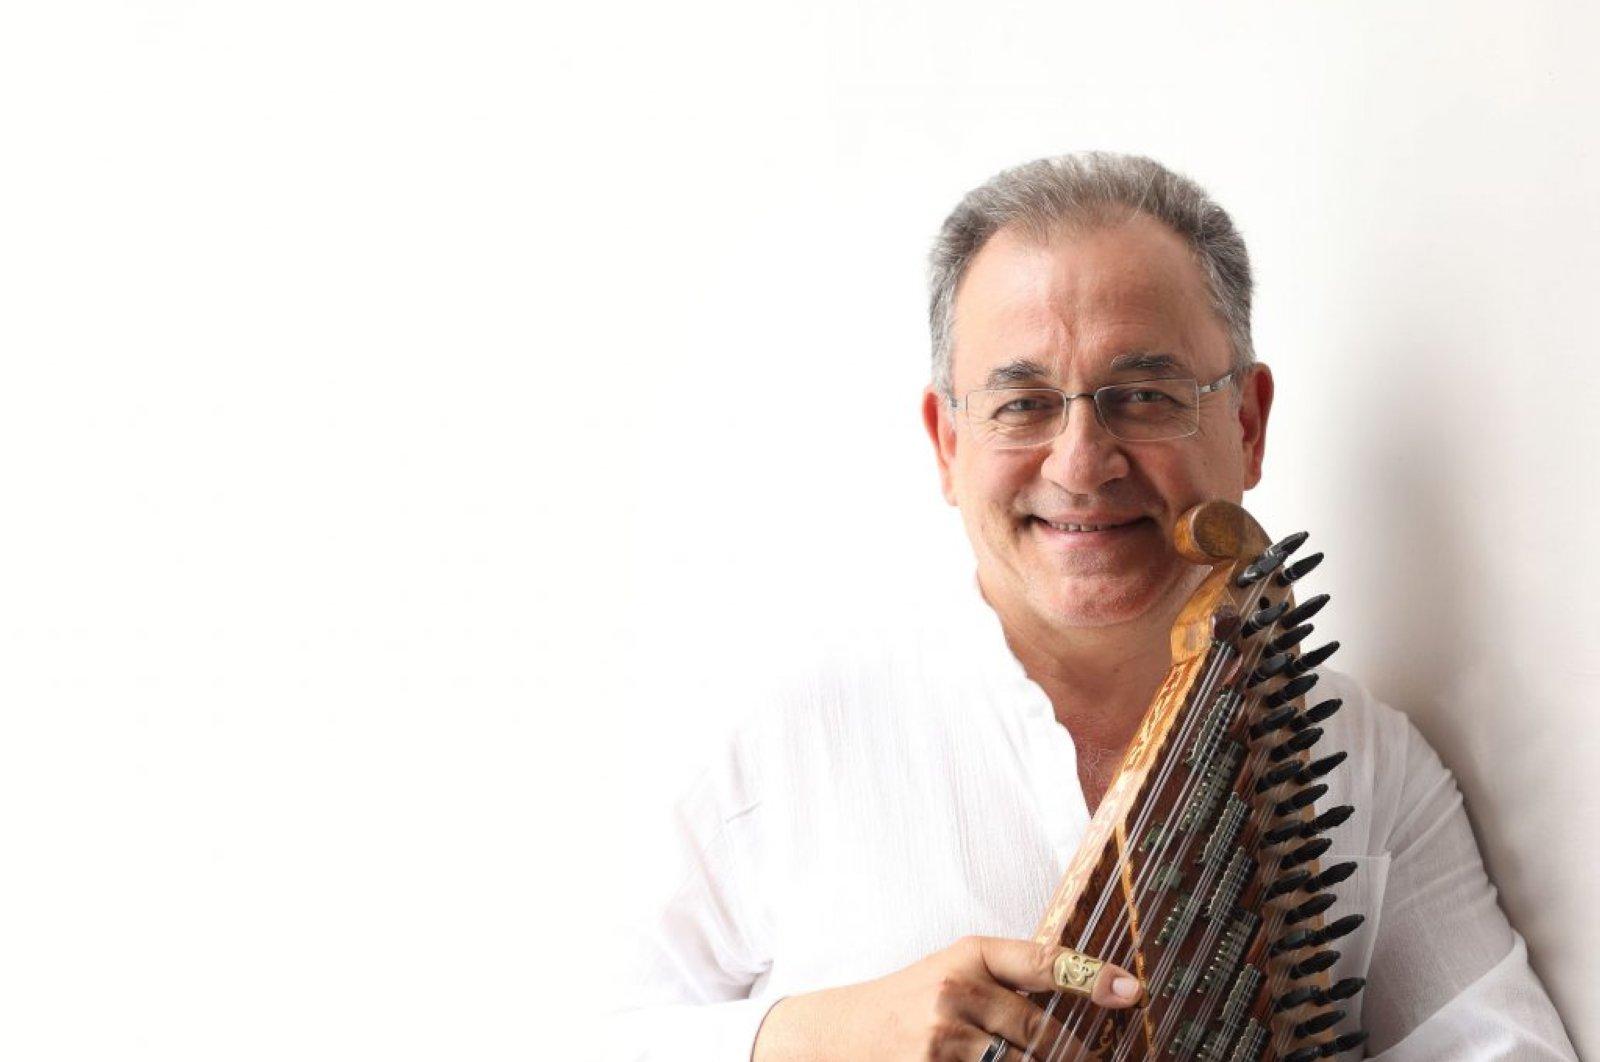 Tahir Aydoğdu poses with his kanun in this undated photo. (AA Photo)